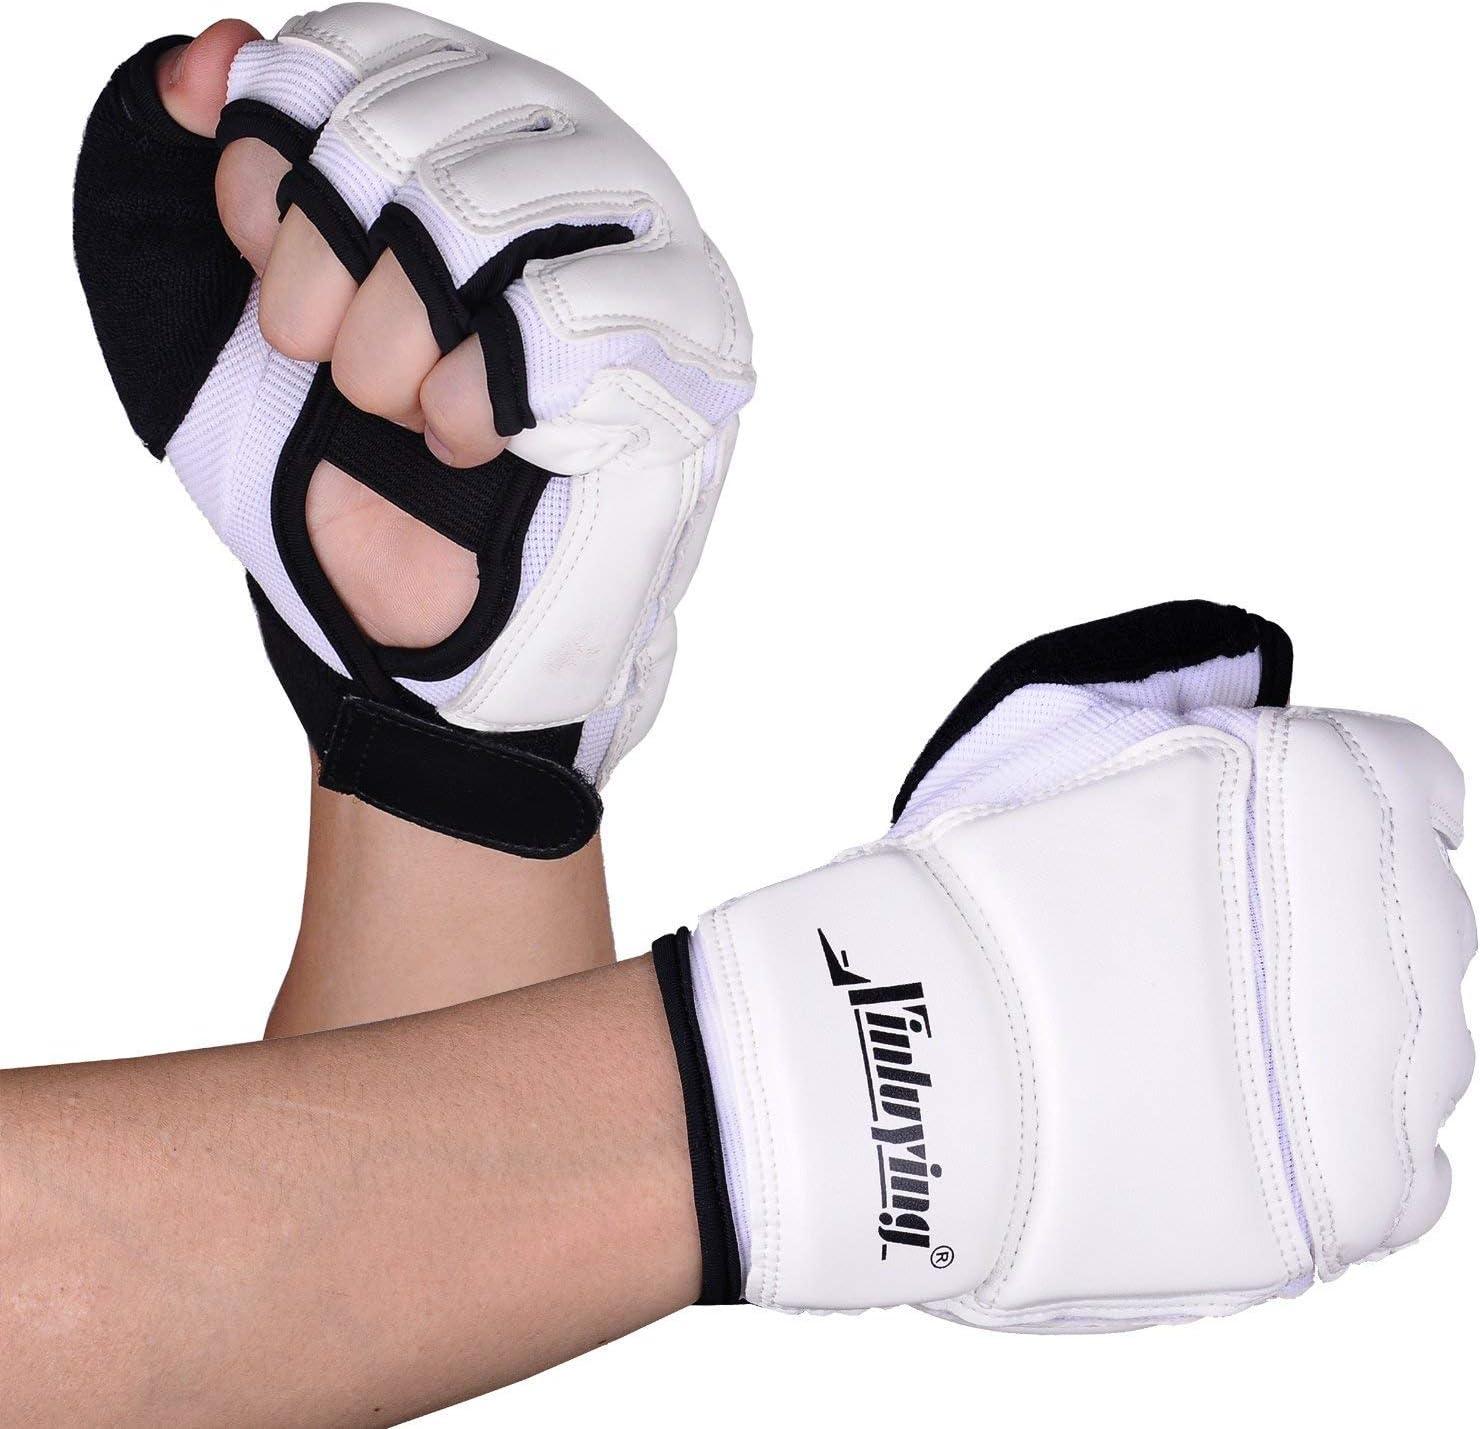 Xinluying Boxhandschuhe MMA Kickboxen Handschuhe Kinder Punchinghandschuhe Taekwondo Kampfsport Grapling Freefight Boxsack Sandsack Boxer Thai Sparring Training Herren Damen